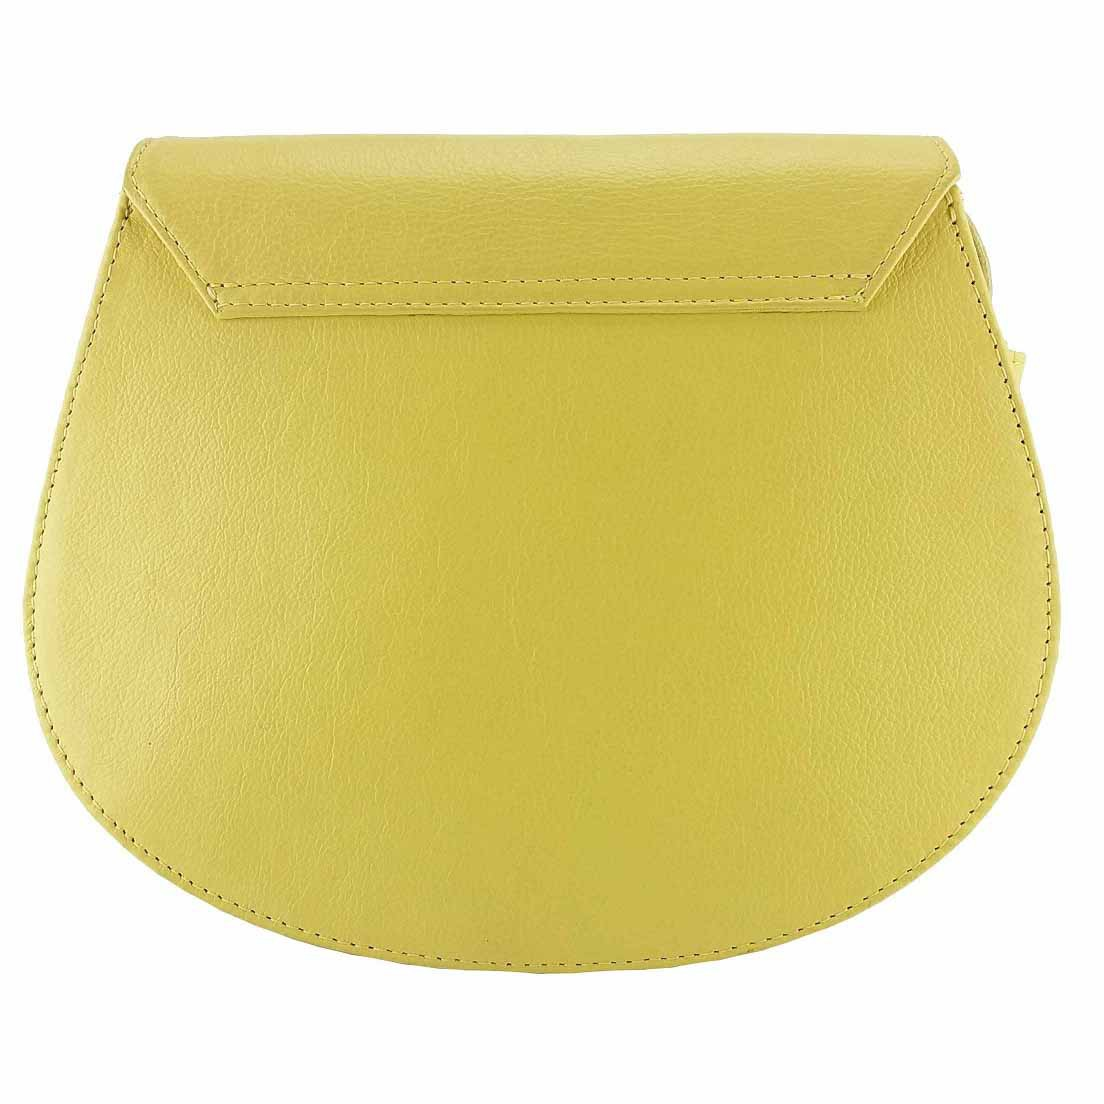 Bolsa Classe Couro Transversal Amarelo